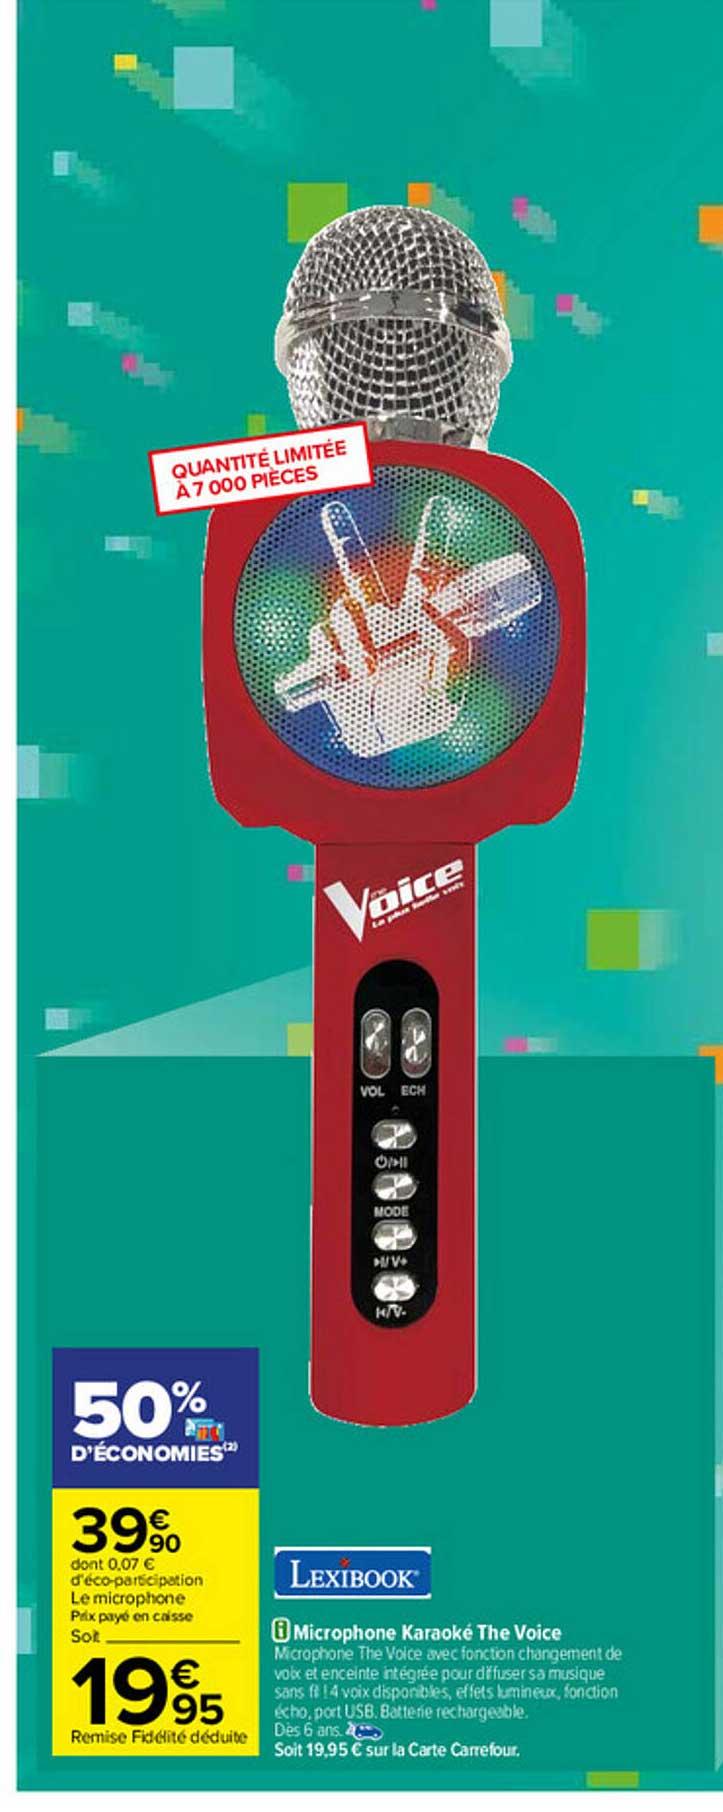 Carrefour Microphone Karaoké The Voice Lexibook